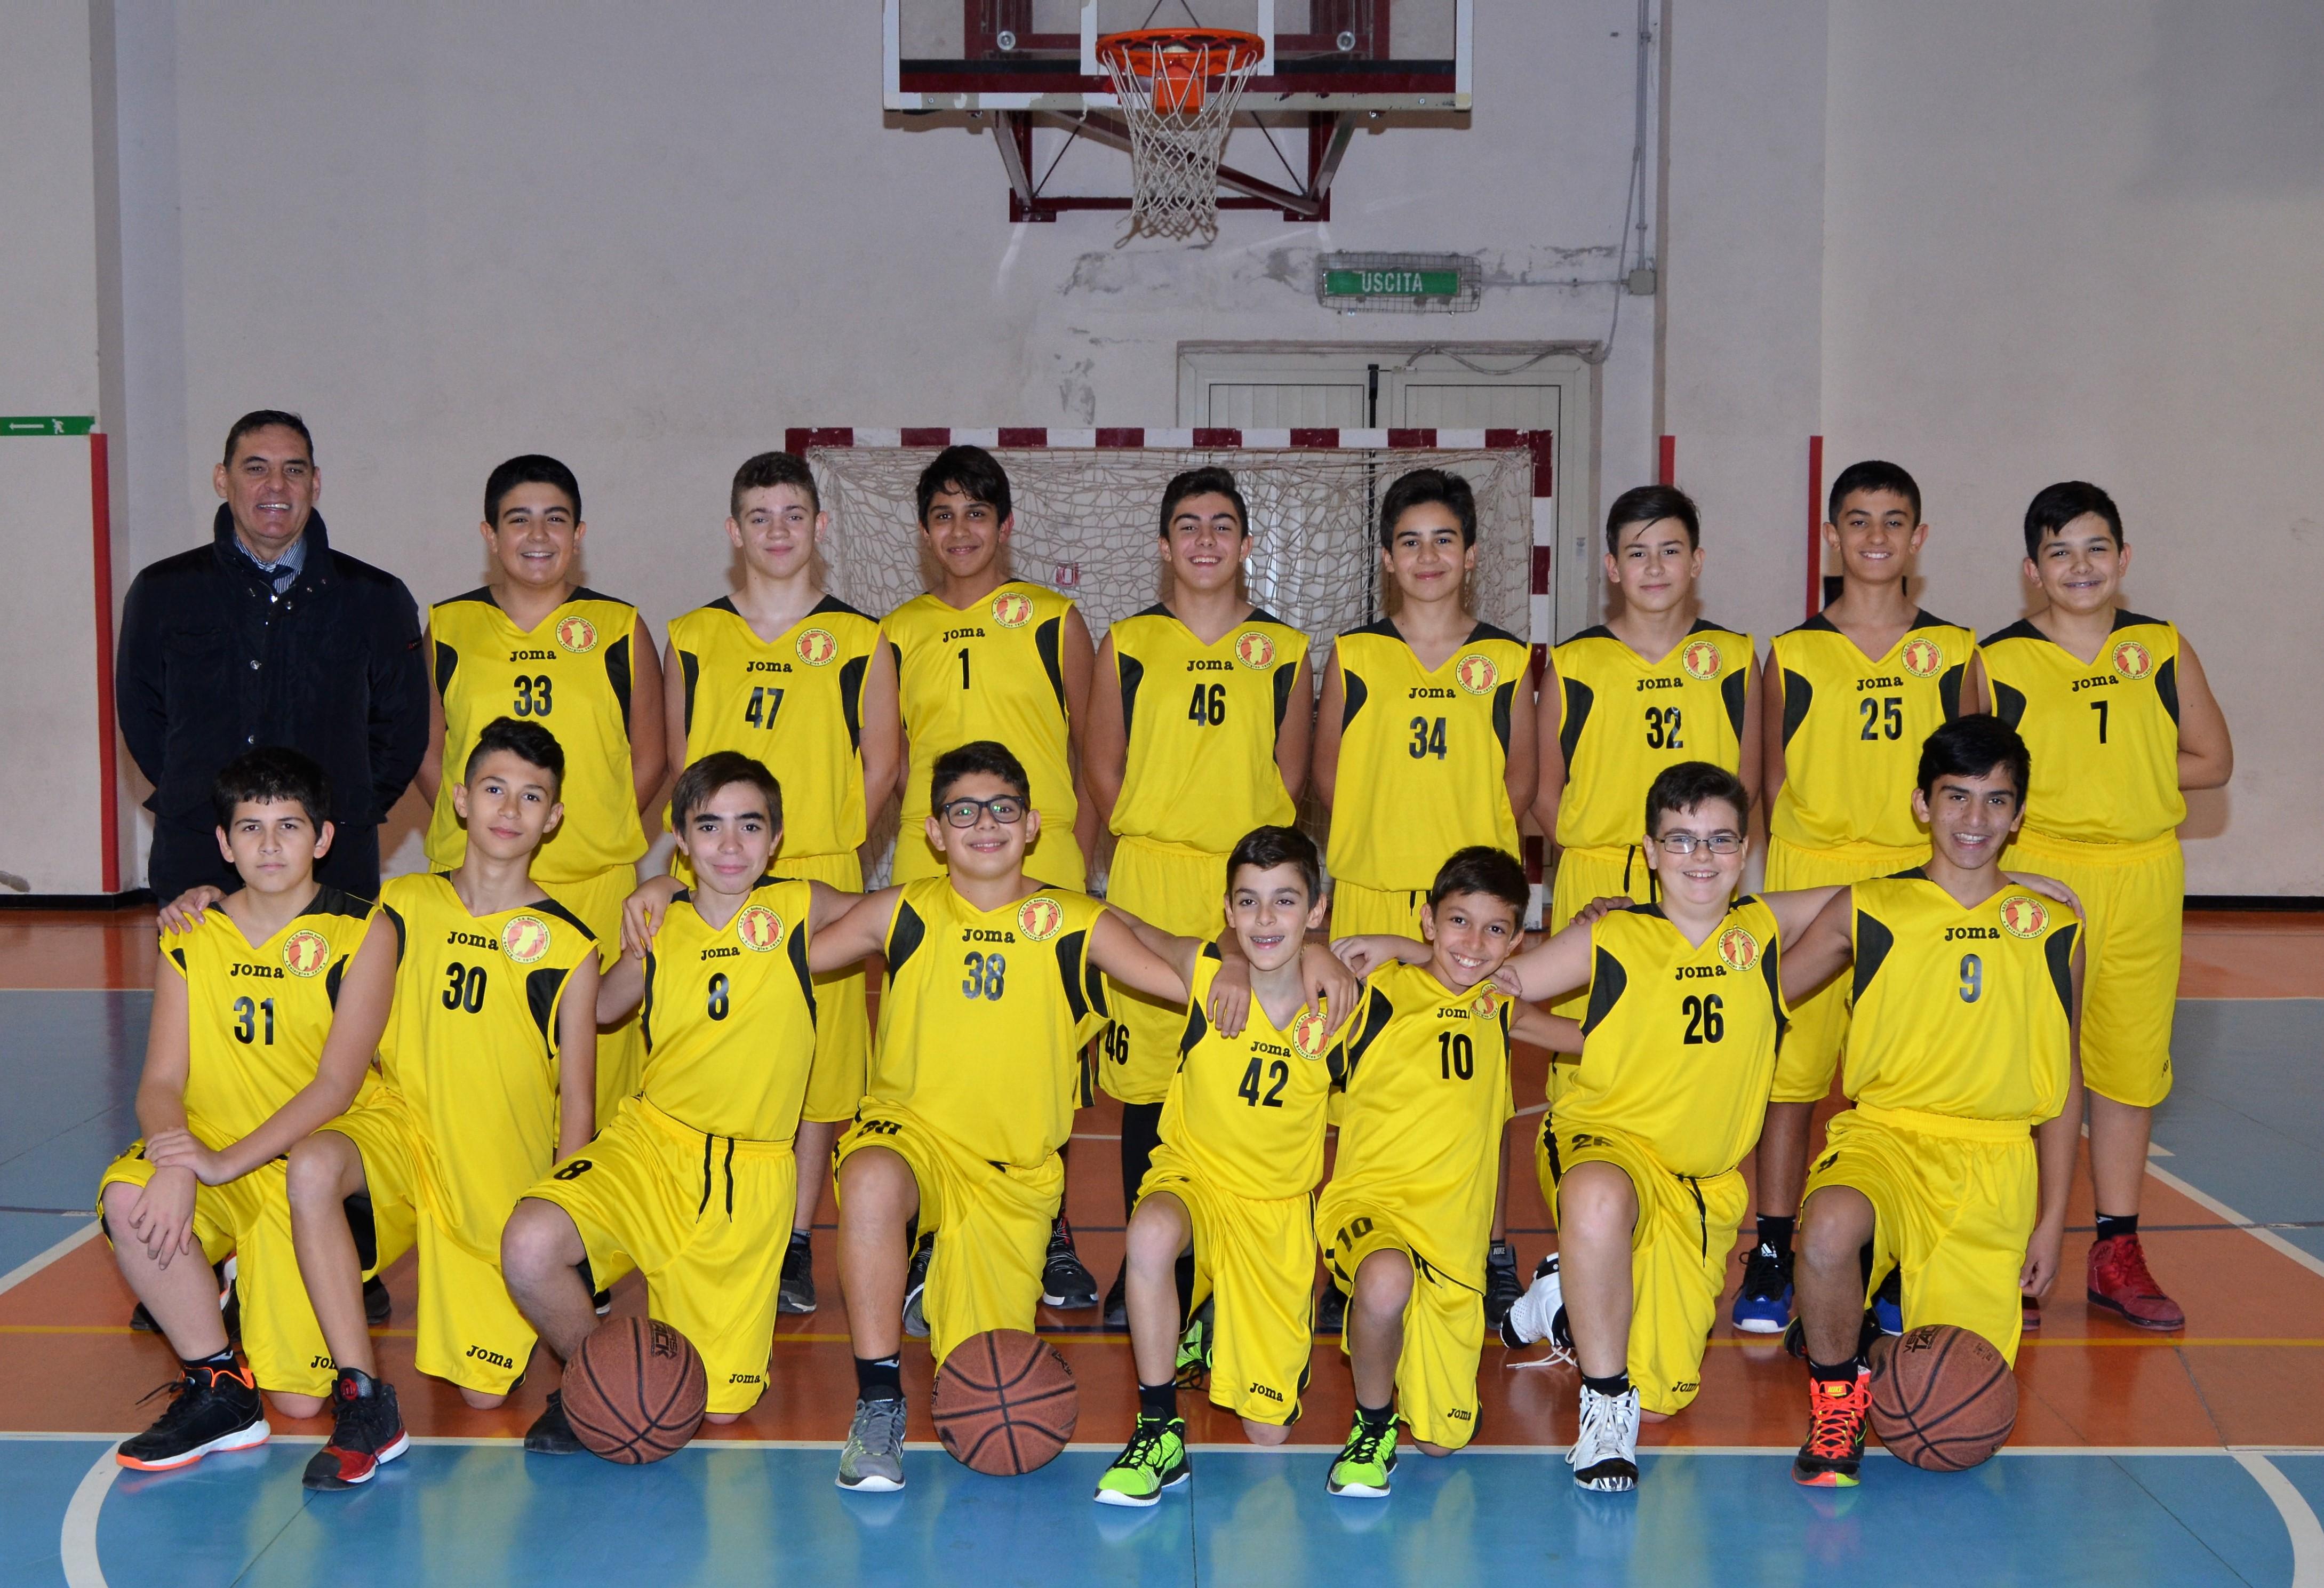 squadra-giallo-dsc_0443